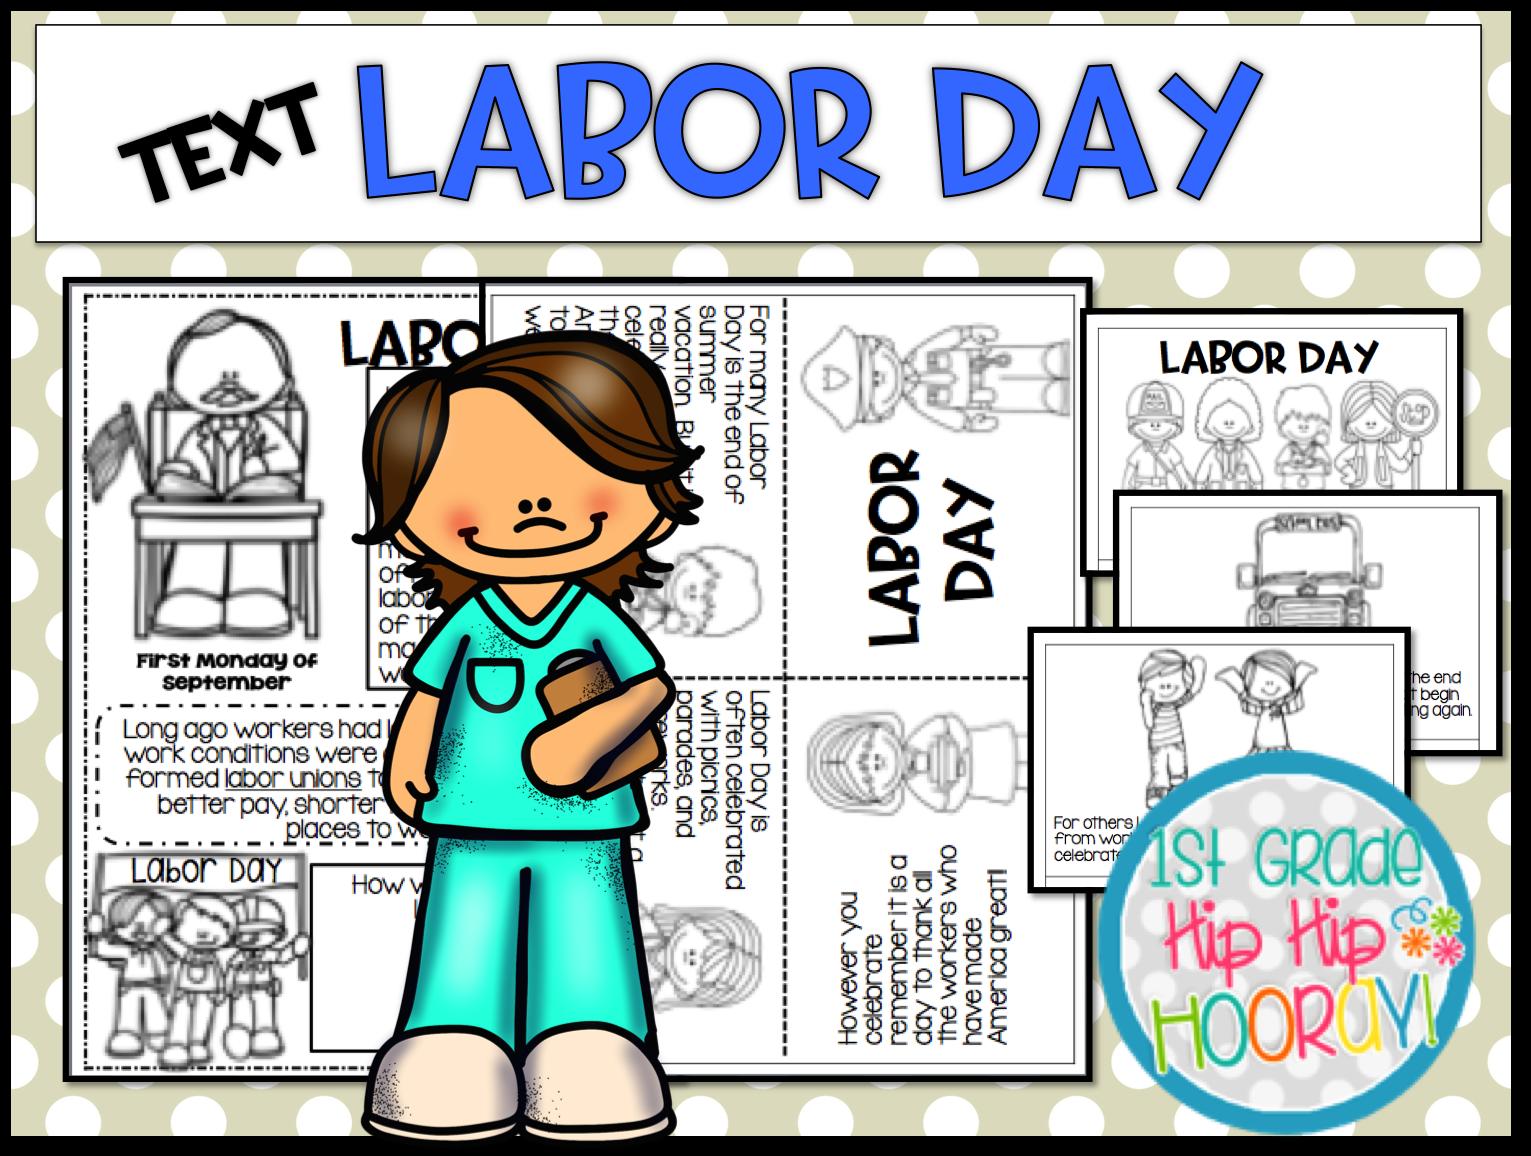 1st Grade Hip Hip Hooray!: Labor Day! [ 1156 x 1531 Pixel ]